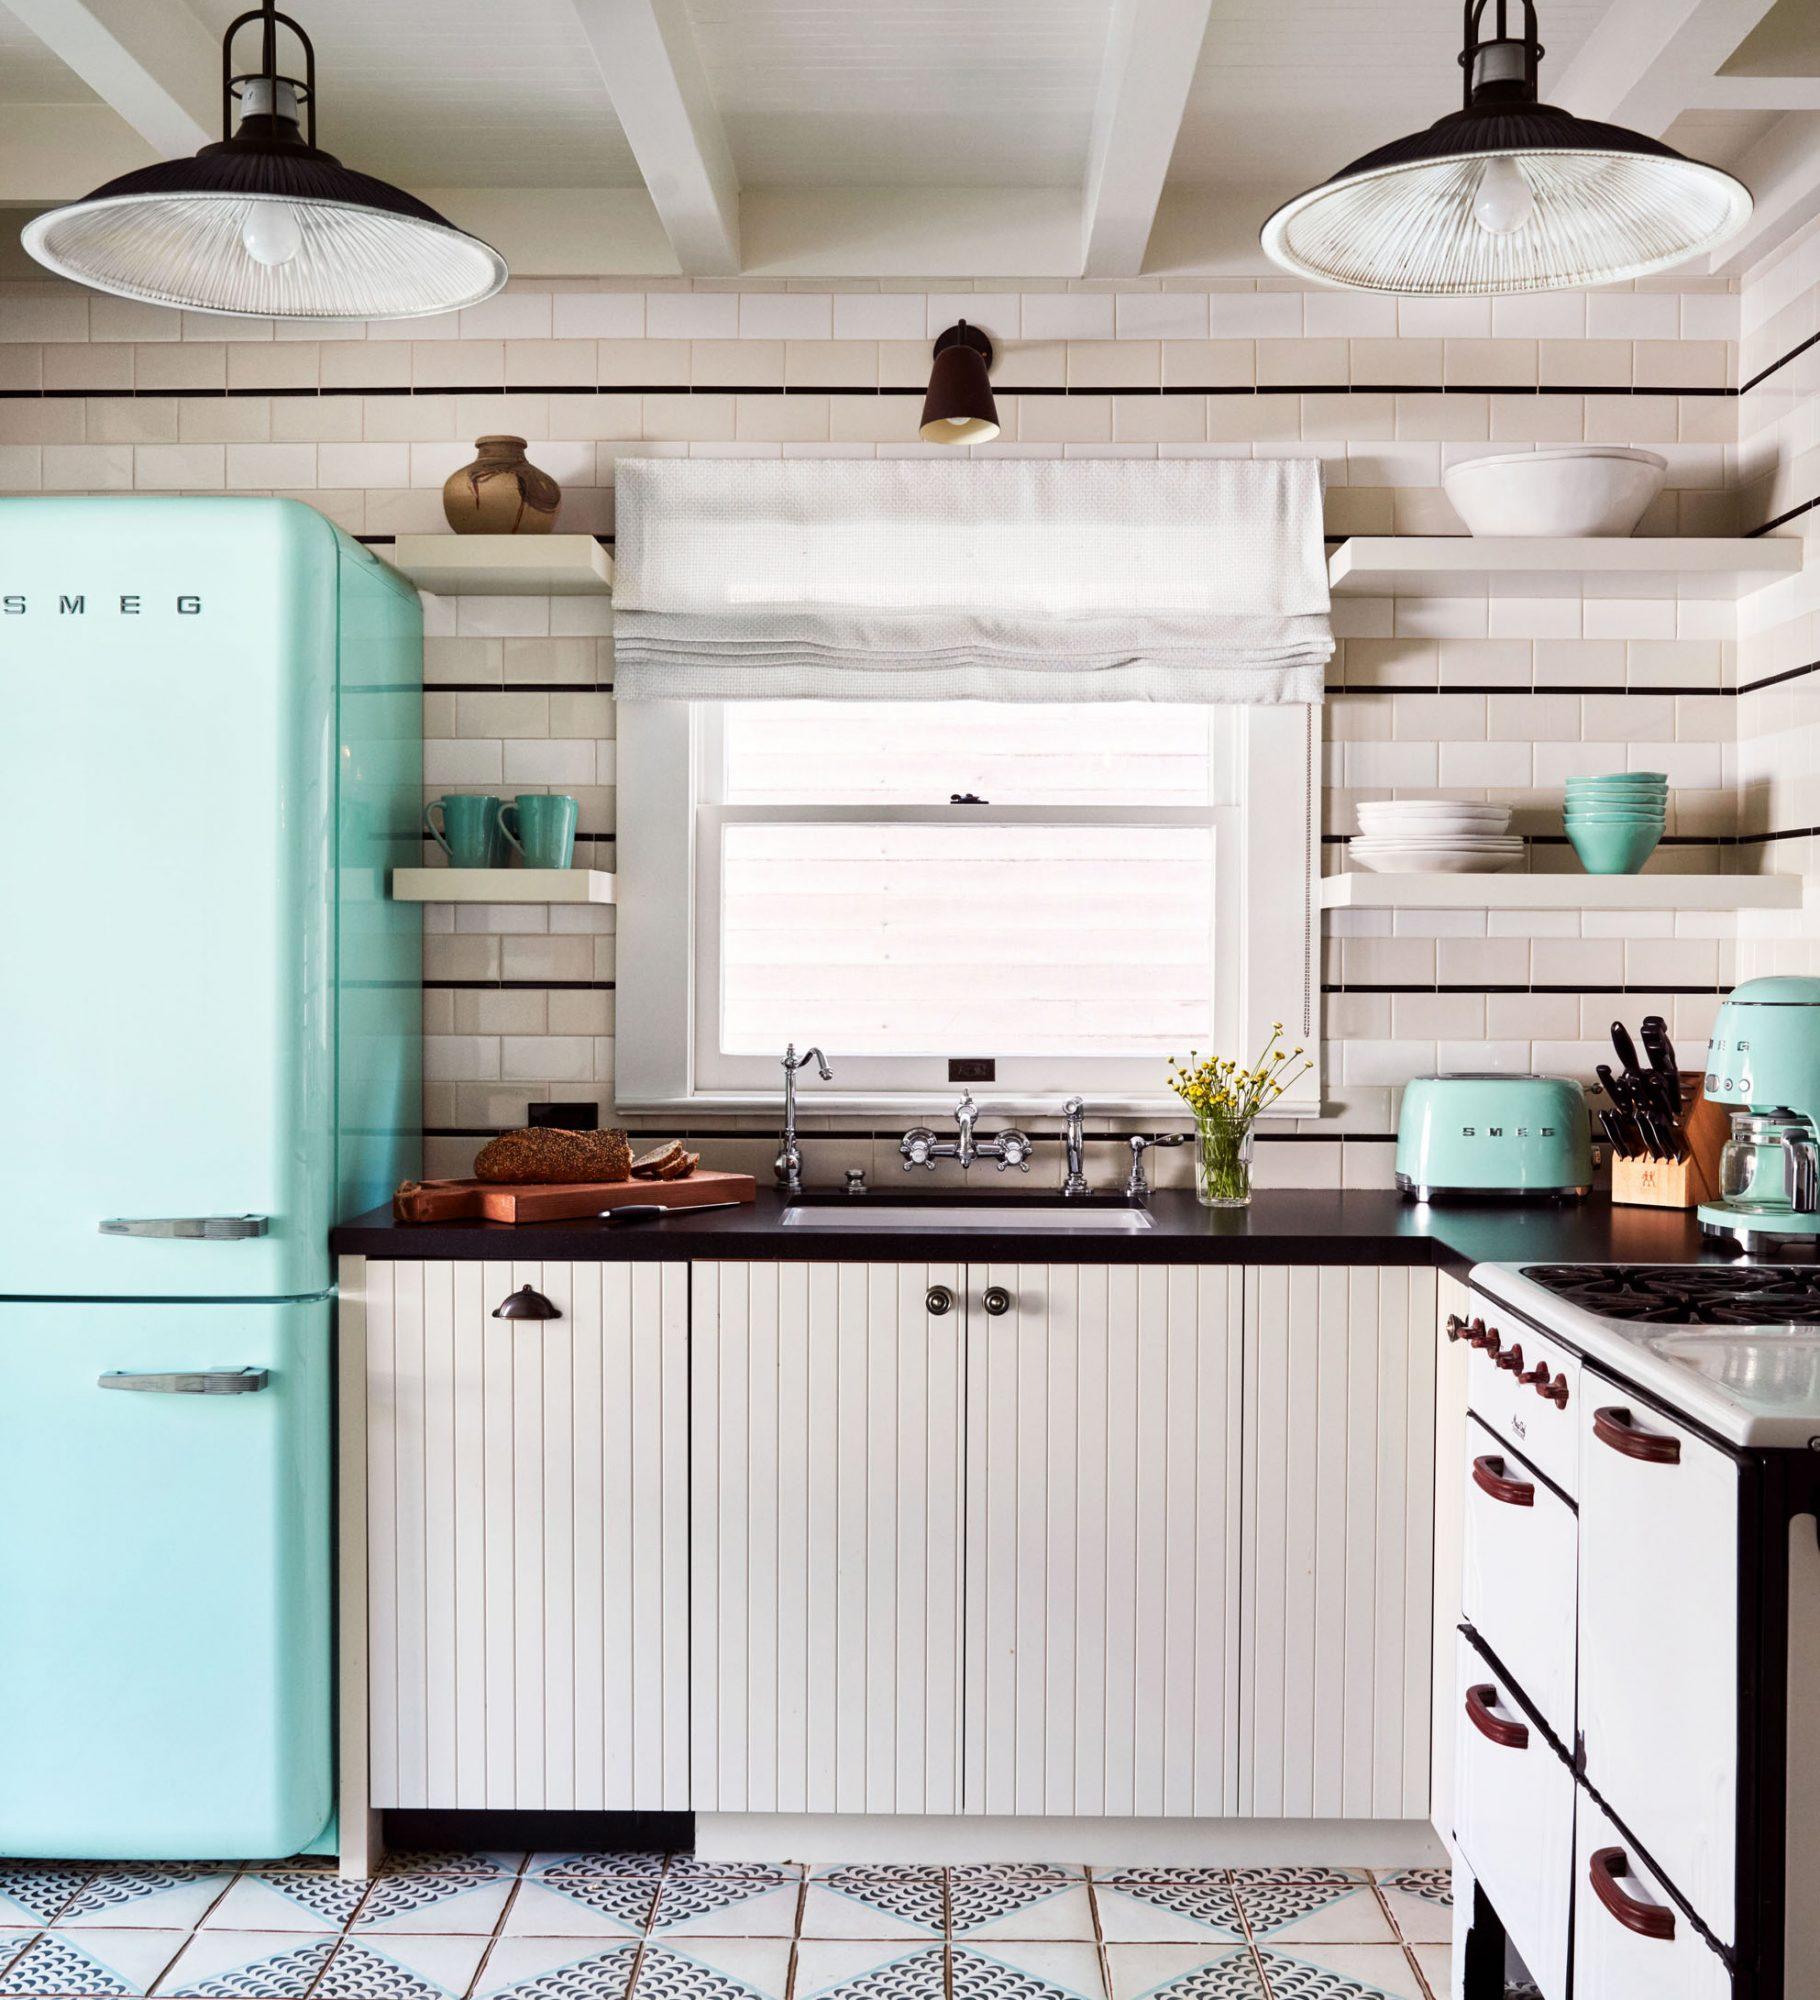 white kitchen with turquoise vintage appliances